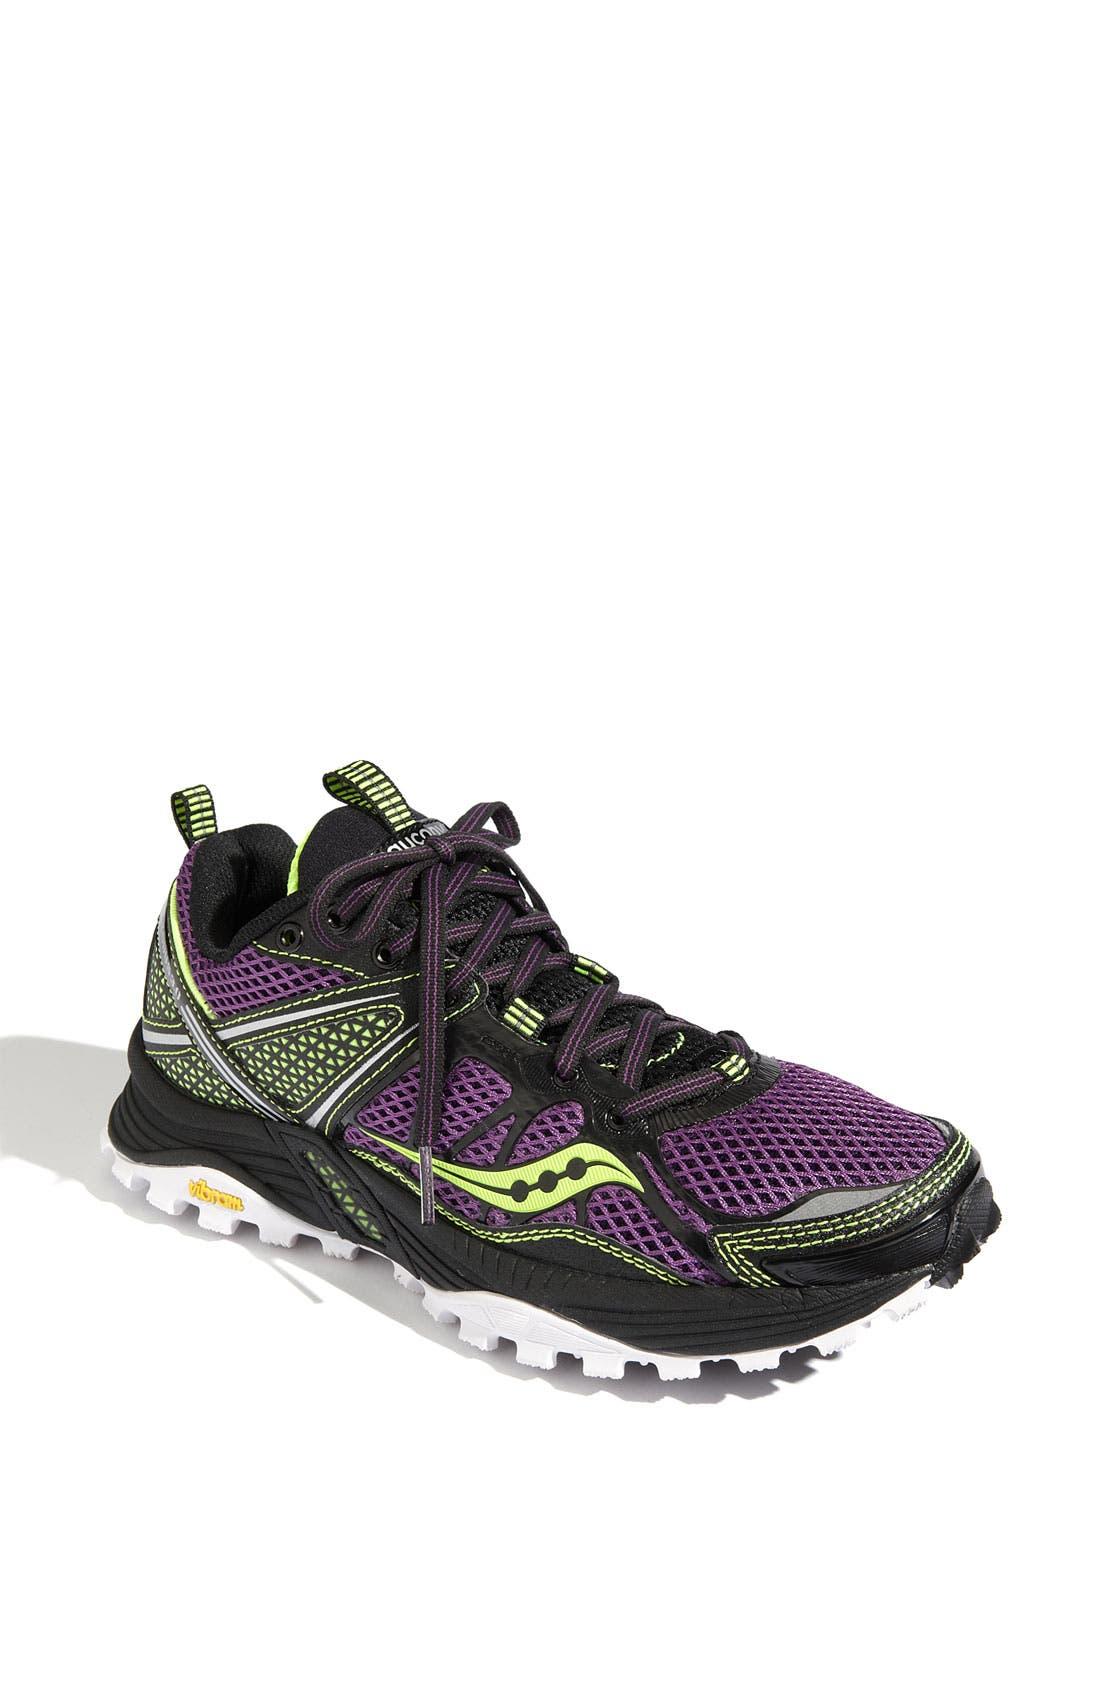 Alternate Image 1 Selected - Saucony 'ProGrid Xodus 3.0' Running Shoe (Women)